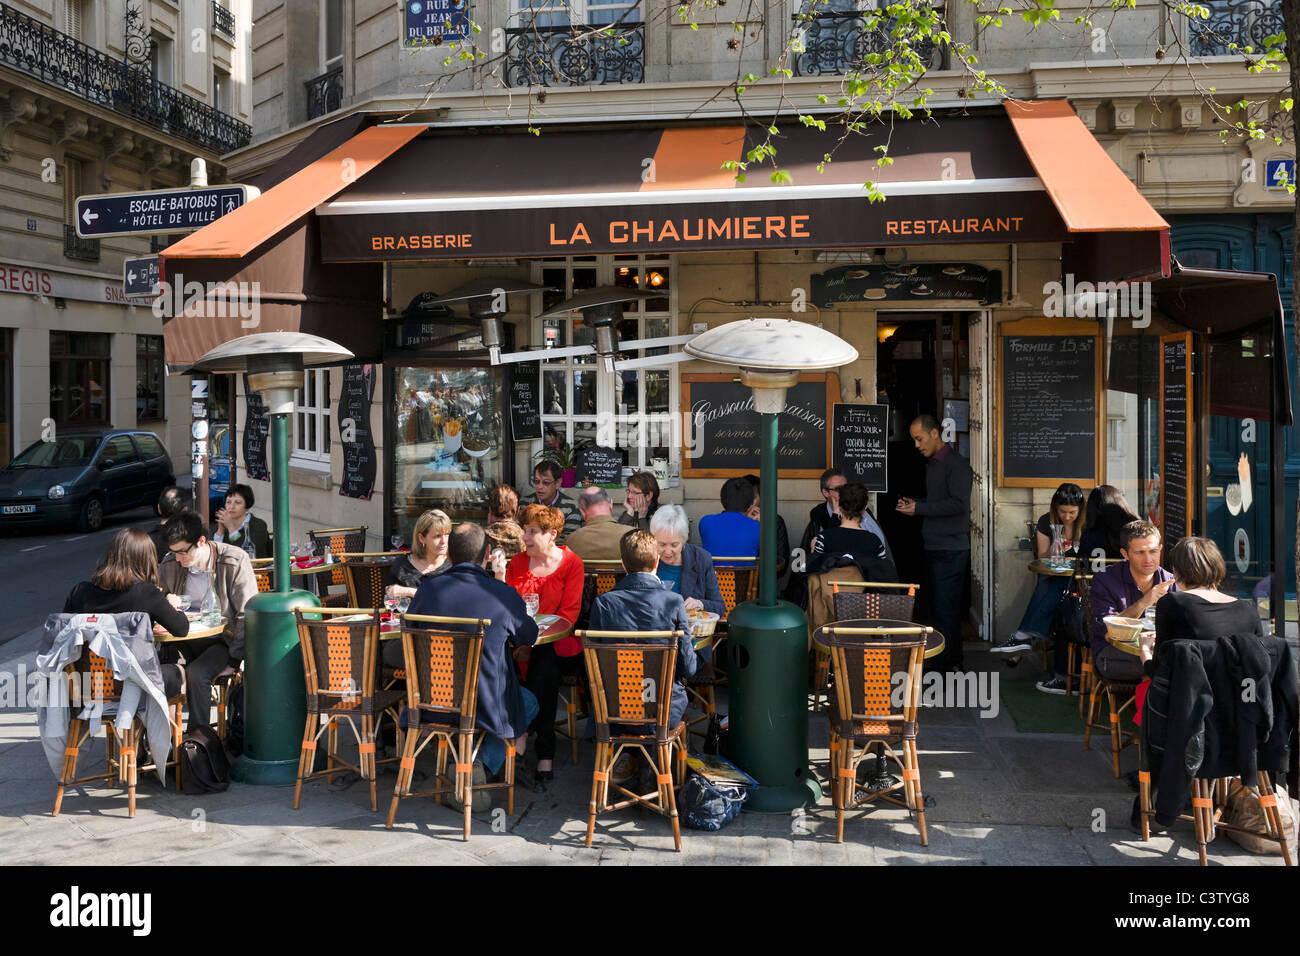 Brasserie on the Rue Jean du Bellay, Ile Saint-Louis, Paris, France - Stock Image